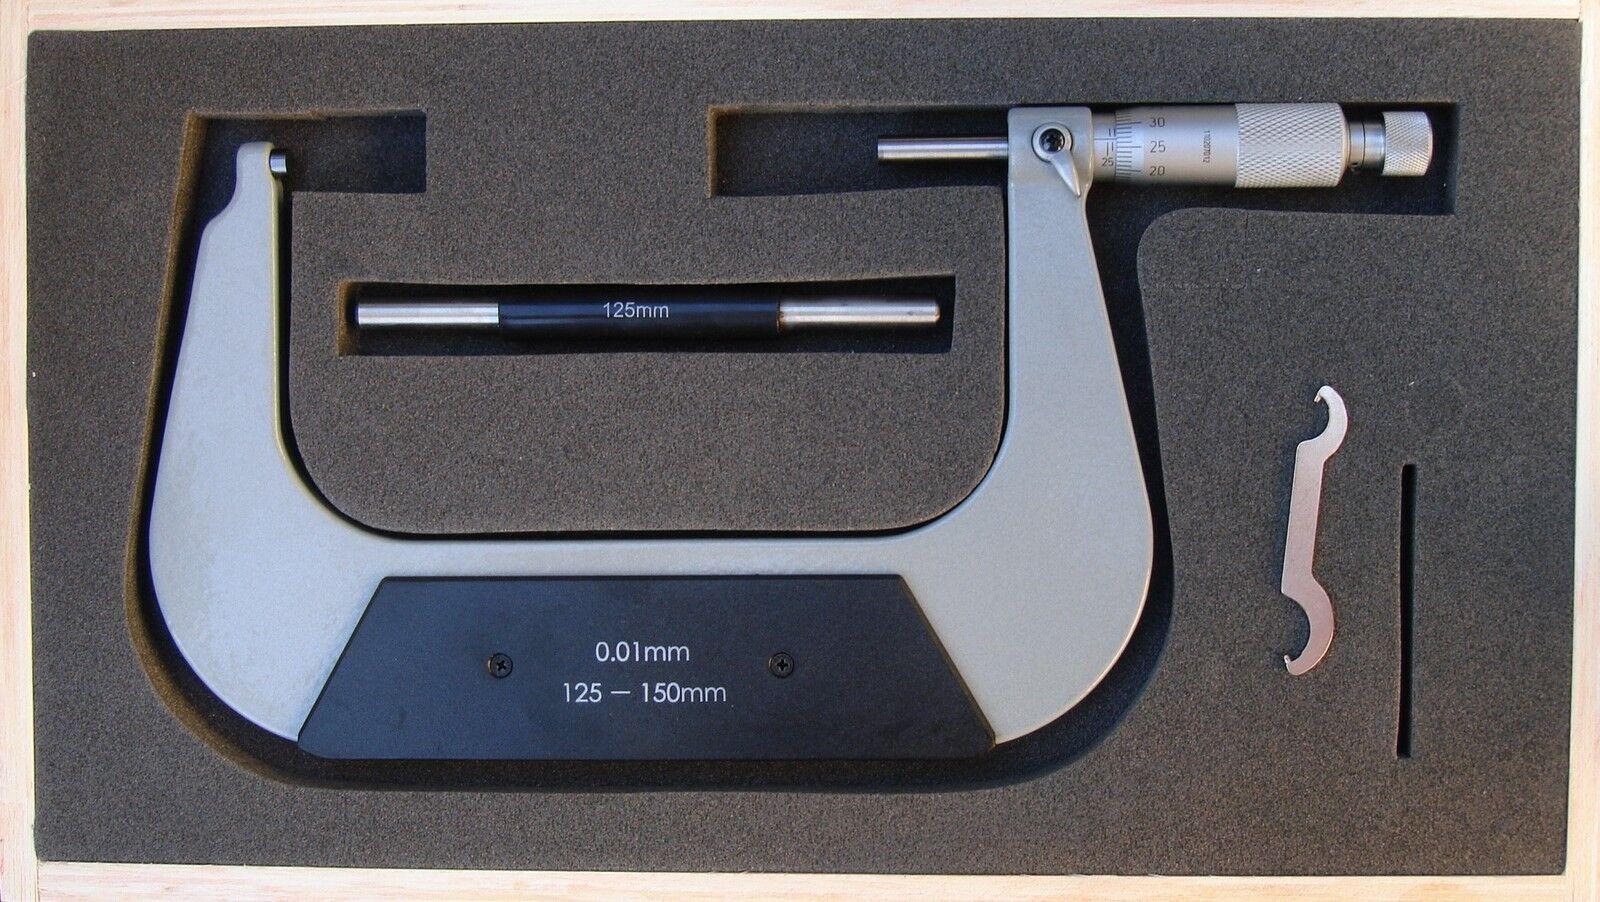 Bügelmeßschraube Bügelmeßschraube Bügelmeßschraube Mikrometer Außenmikrometer 100-125, 125-150, 150-175, 175-200mm | Fairer Preis  | Lebensecht  | Qualität und Quantität garantiert  | Attraktives Aussehen  d0b83f